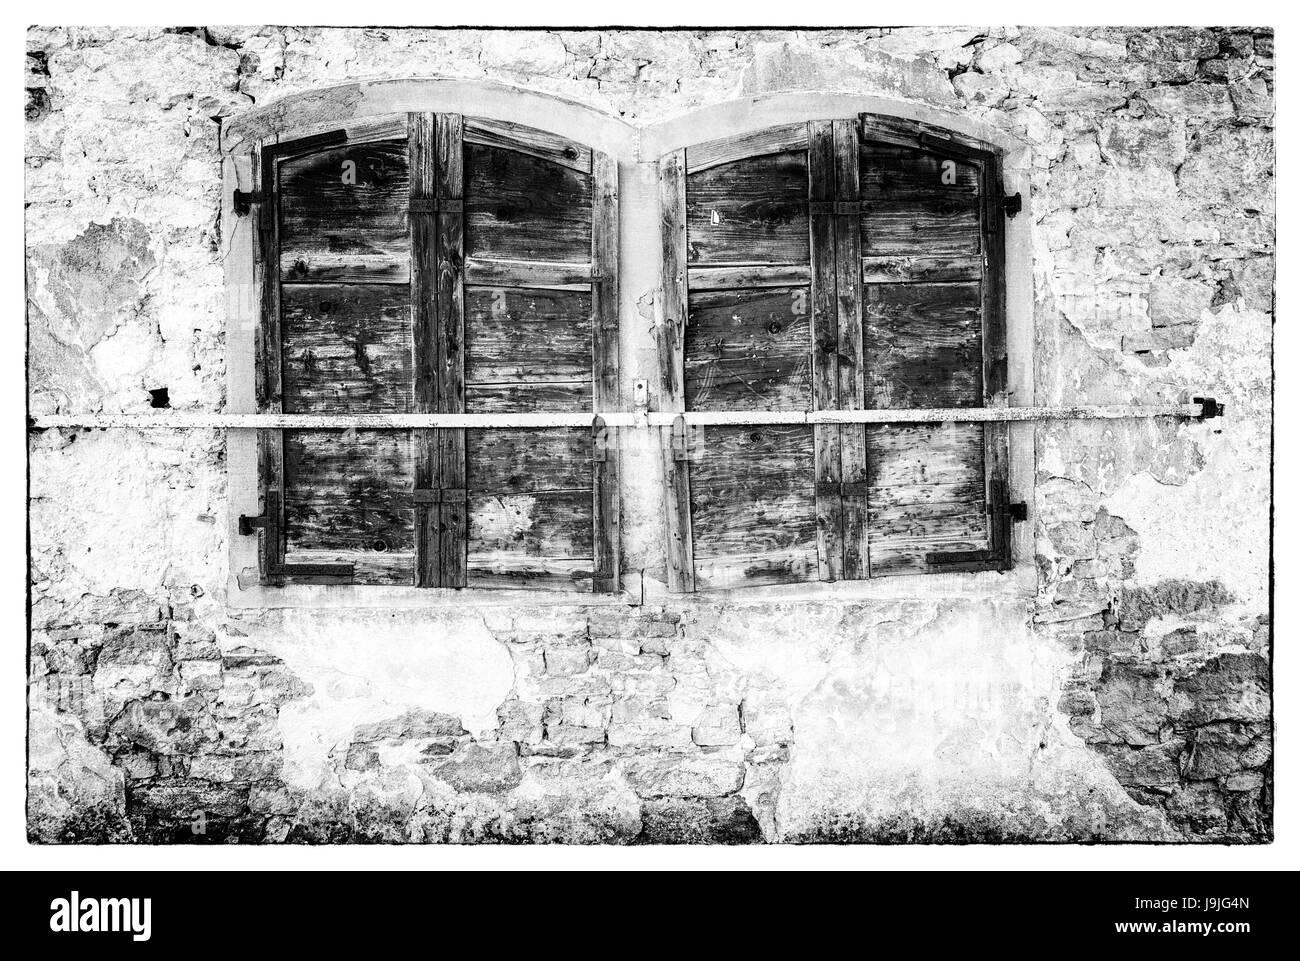 Window, house facade, Münnerstadt, Lower Franconia, Franconia, Bavaria, Germany, Europe - Stock Image